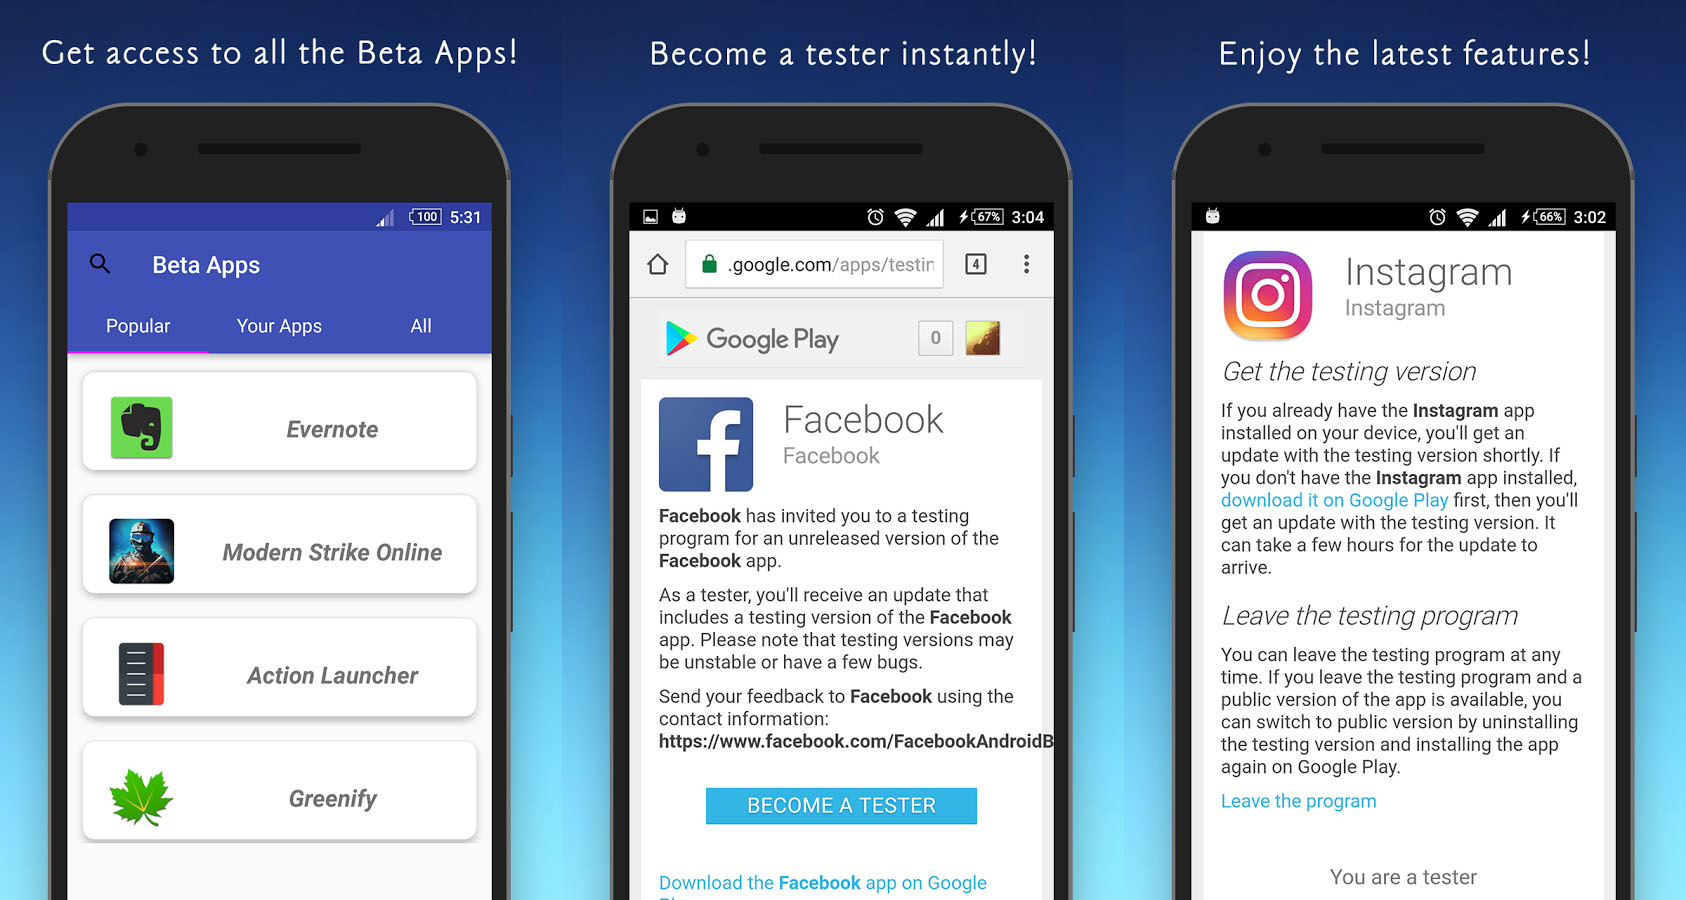 beta-apps